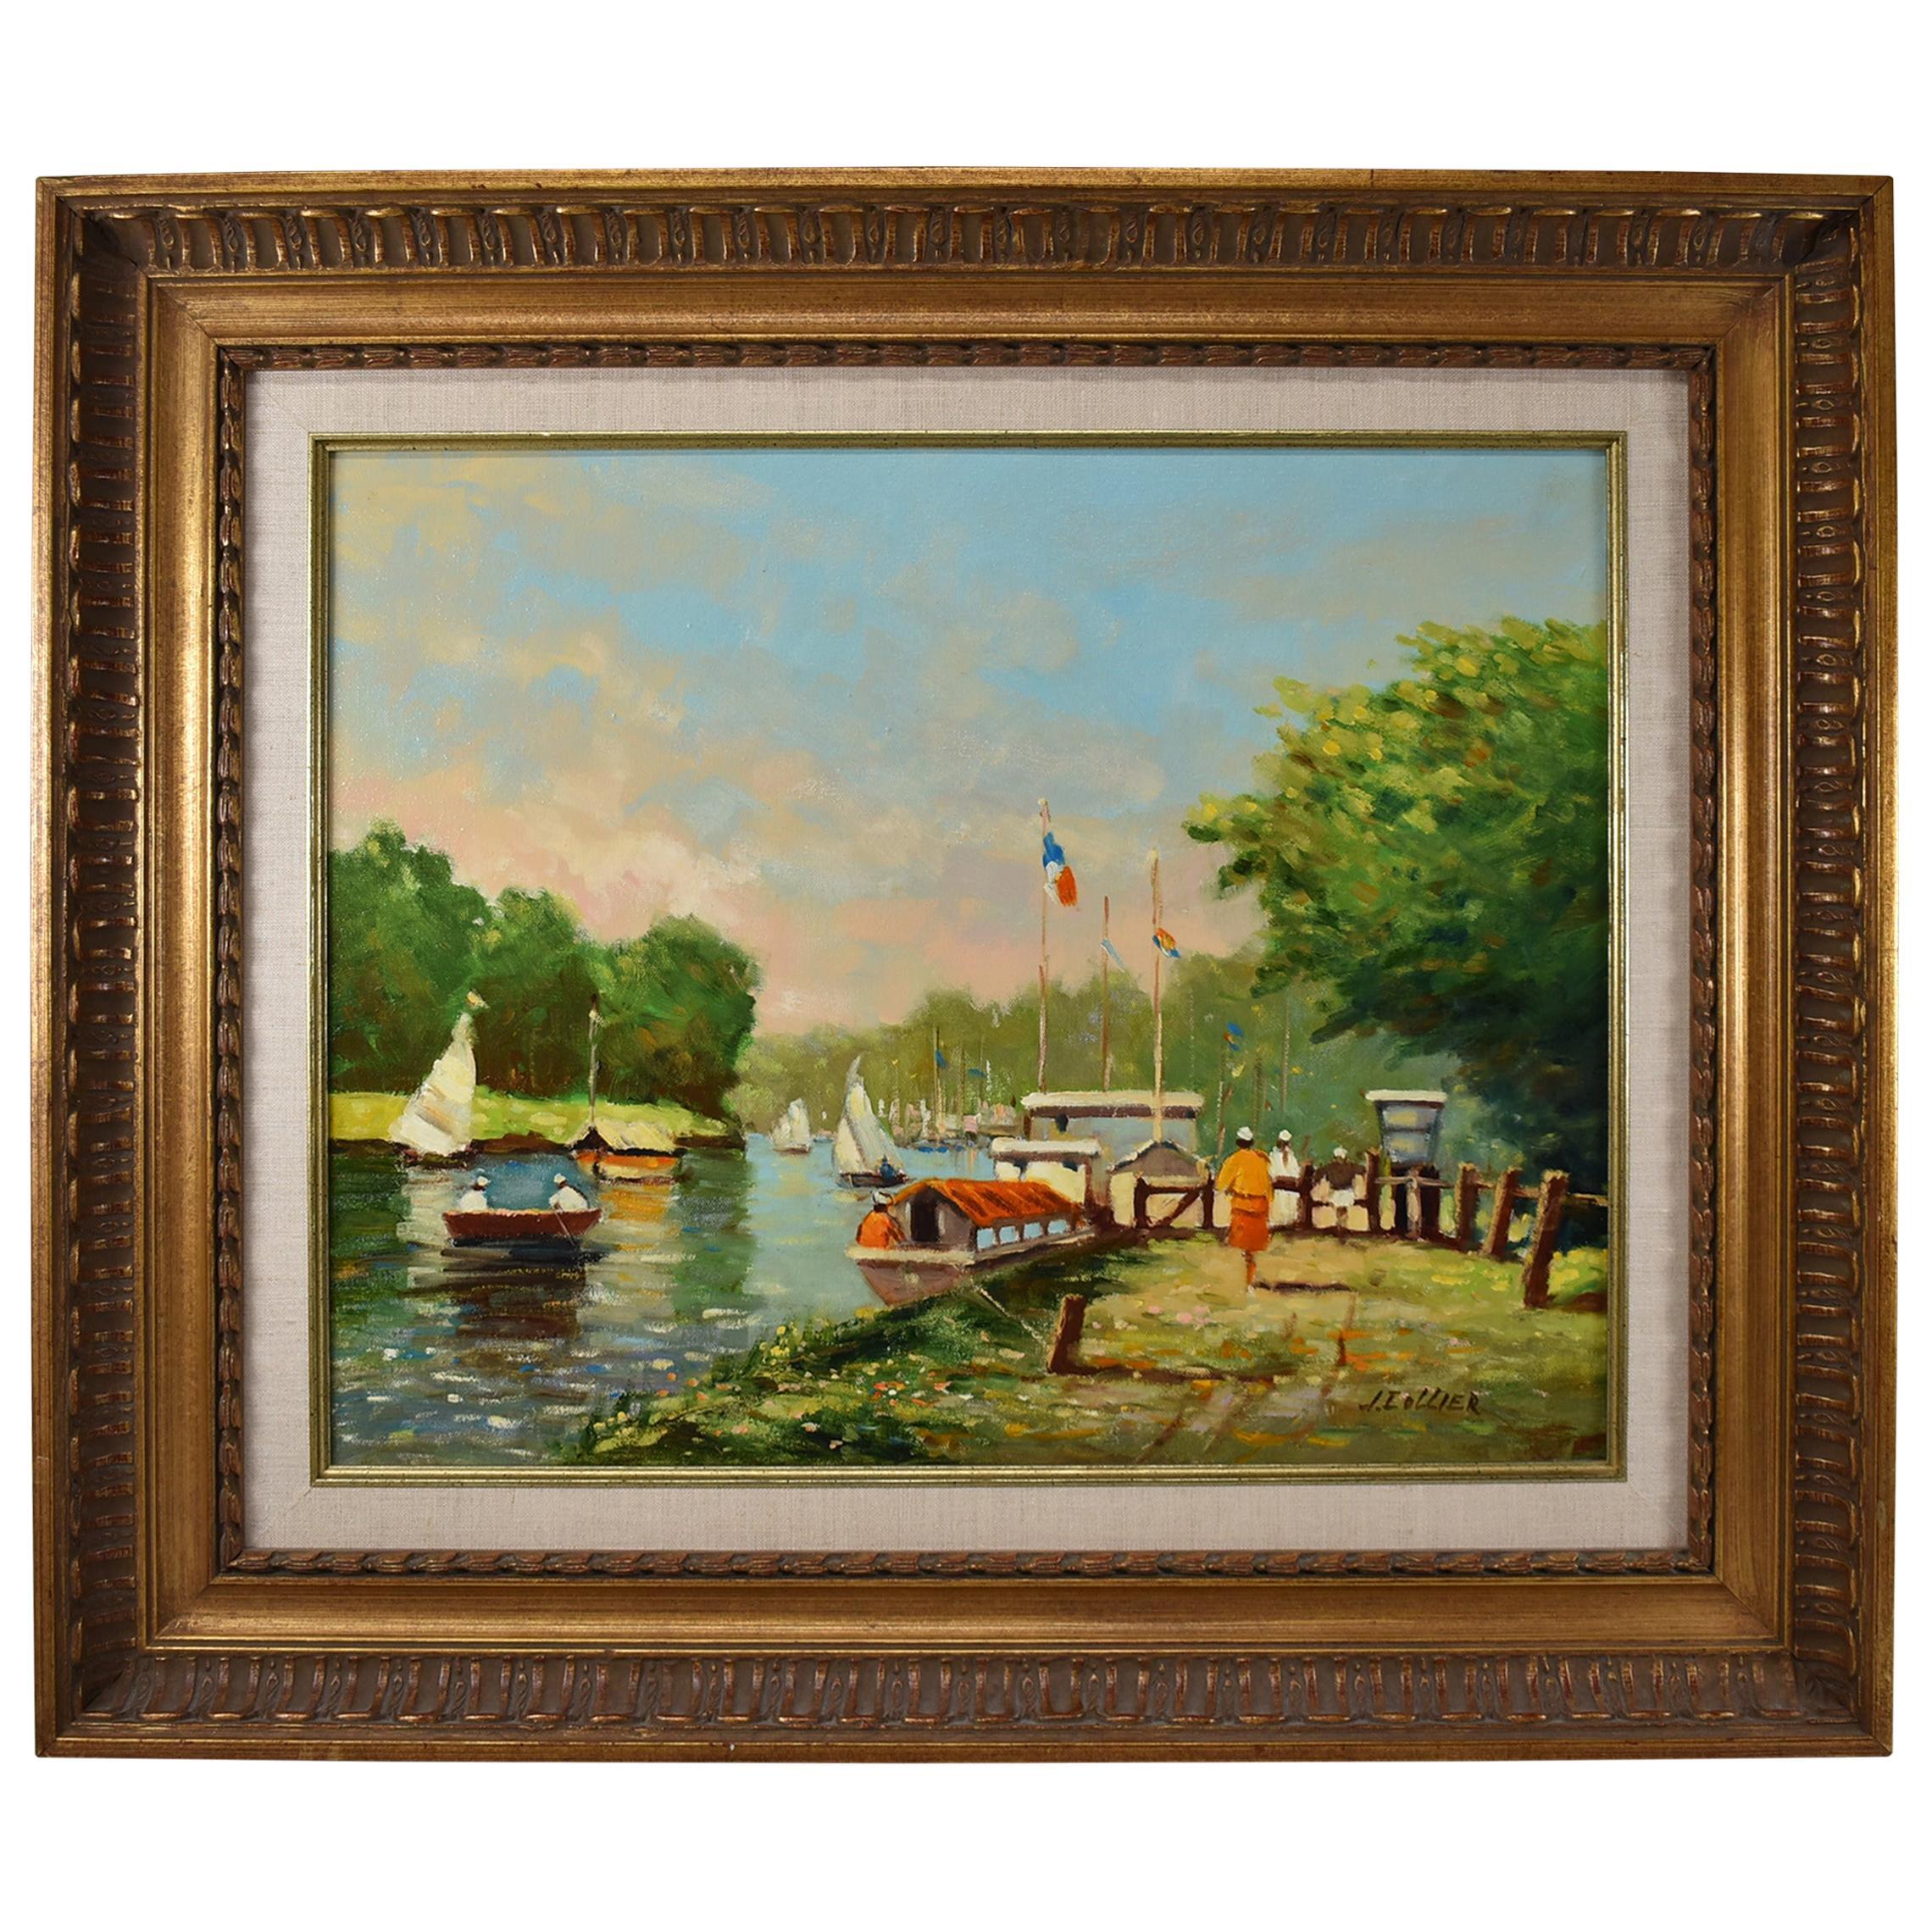 Thames River Scene Original Oil Painting J. Collier